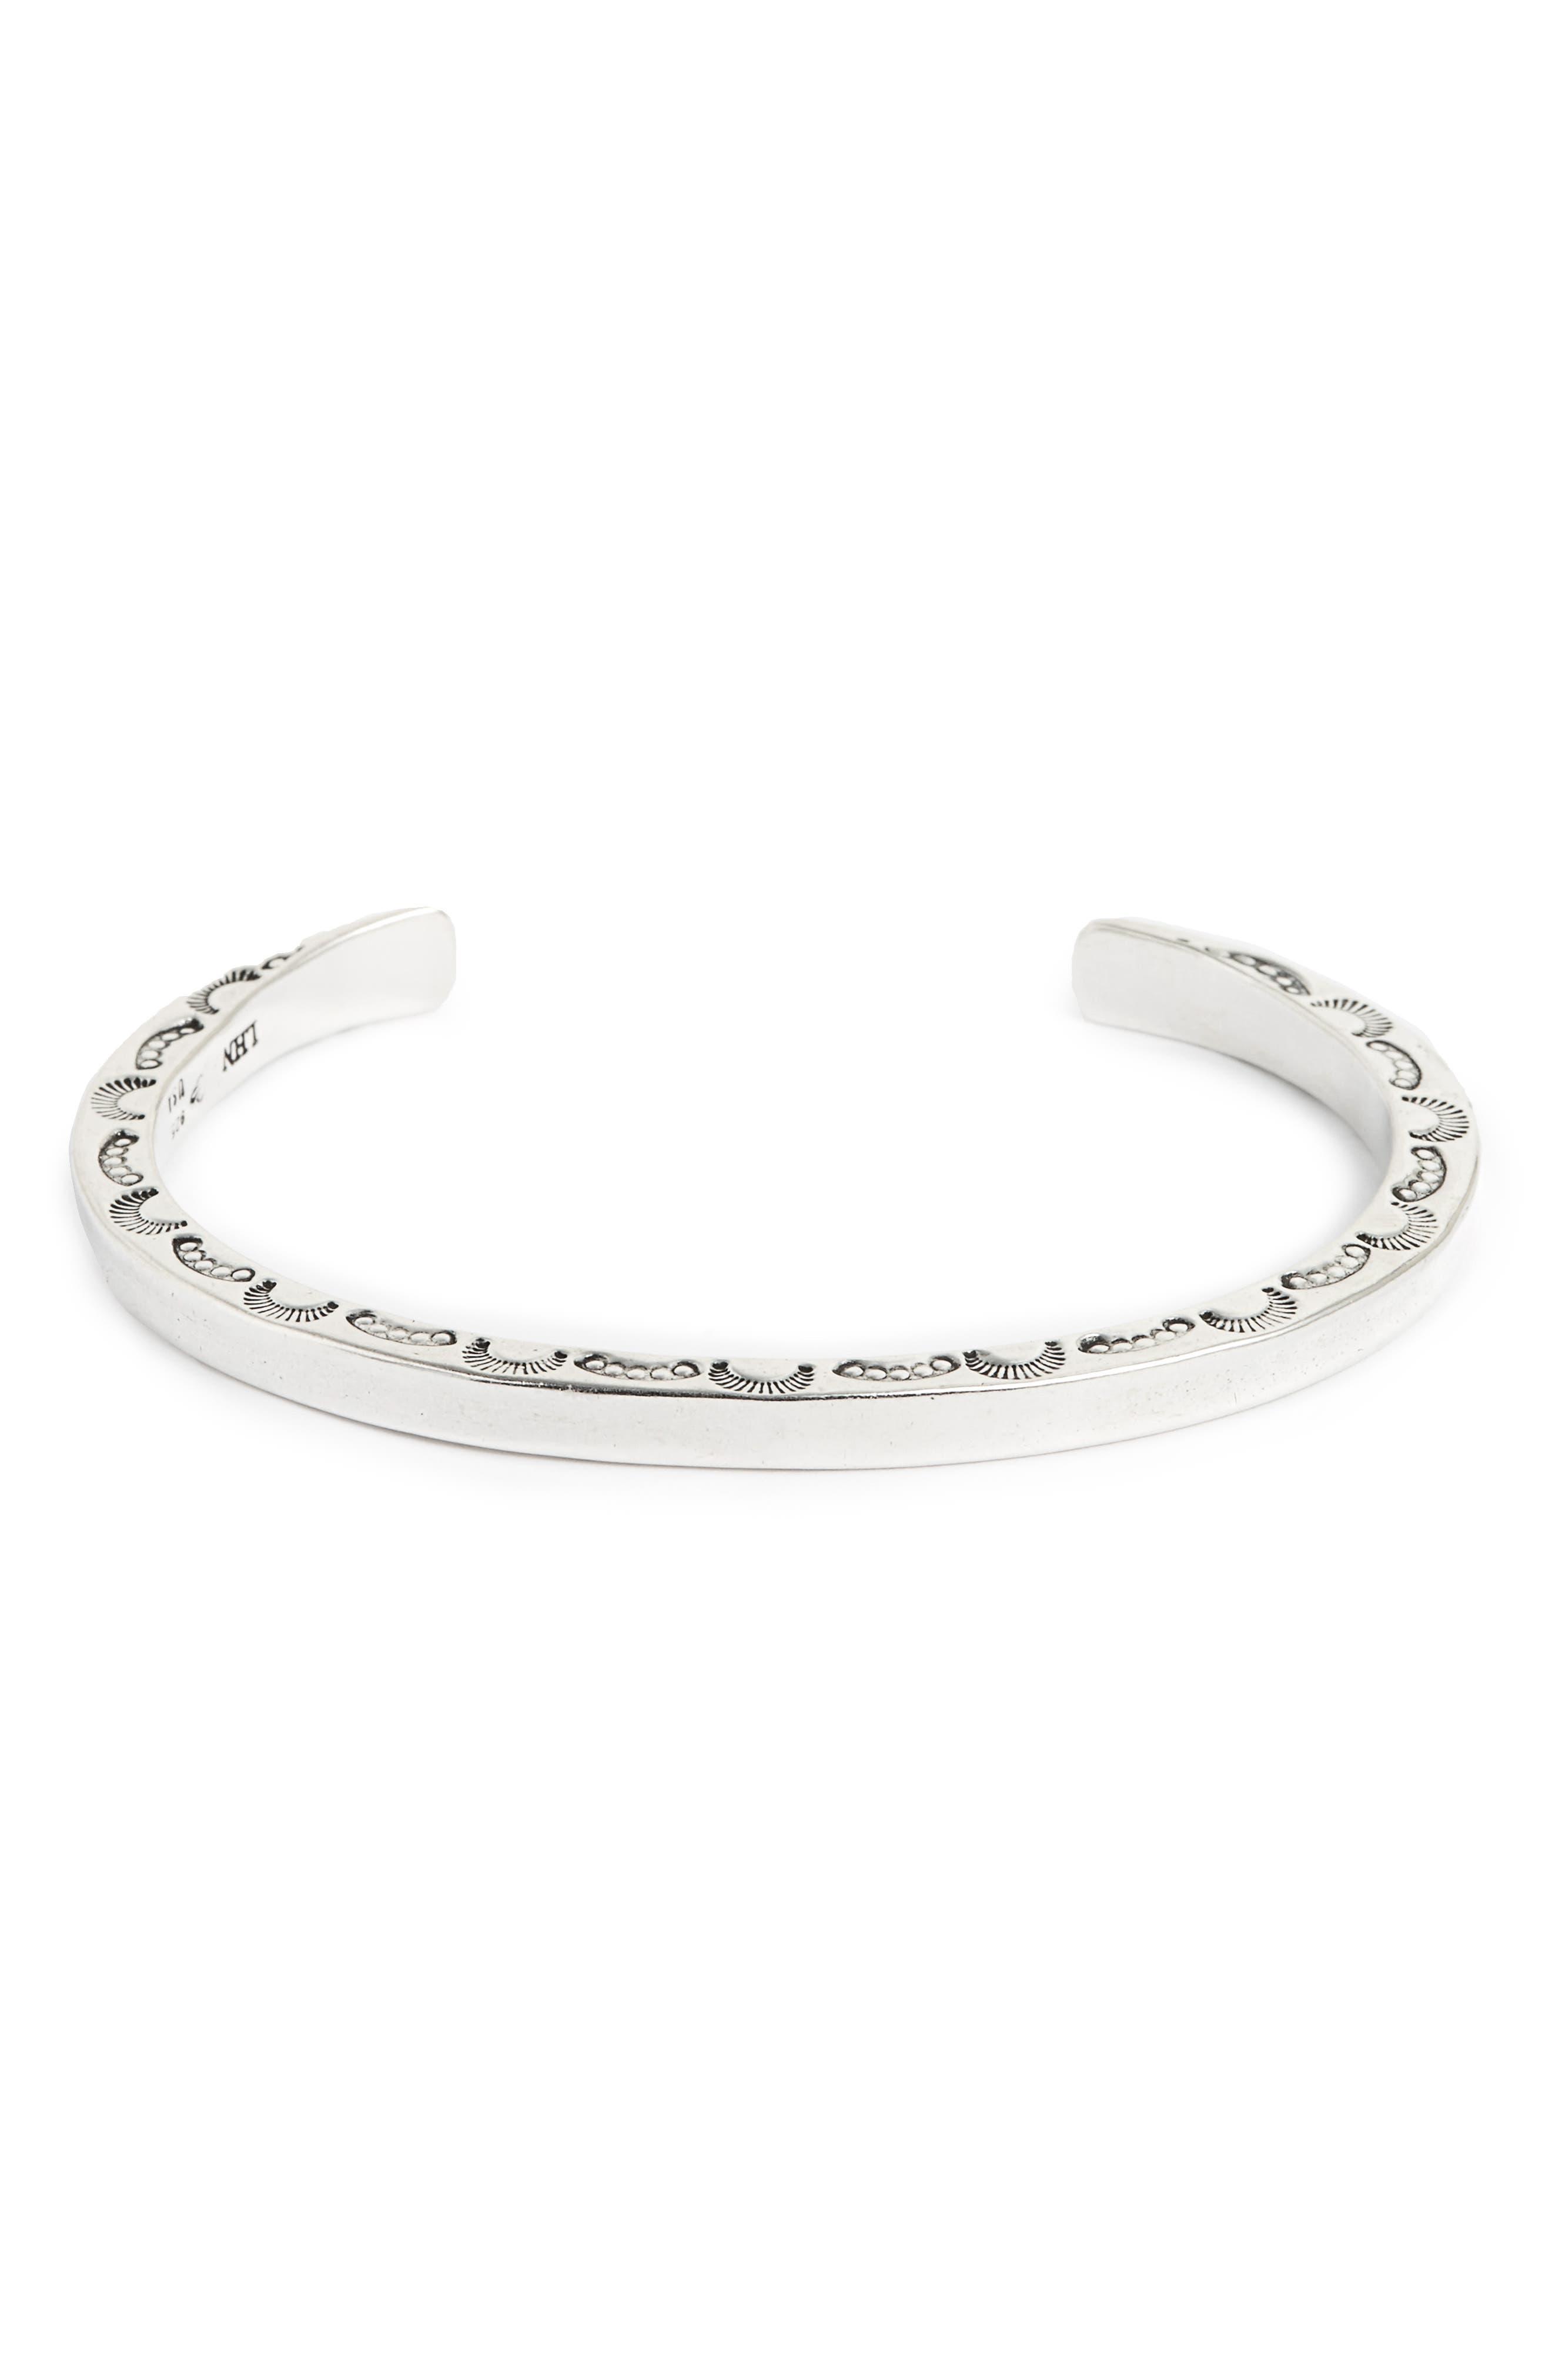 Main Image - Lewis Henry Nicholas Sterling Silver Cuff Bracelet